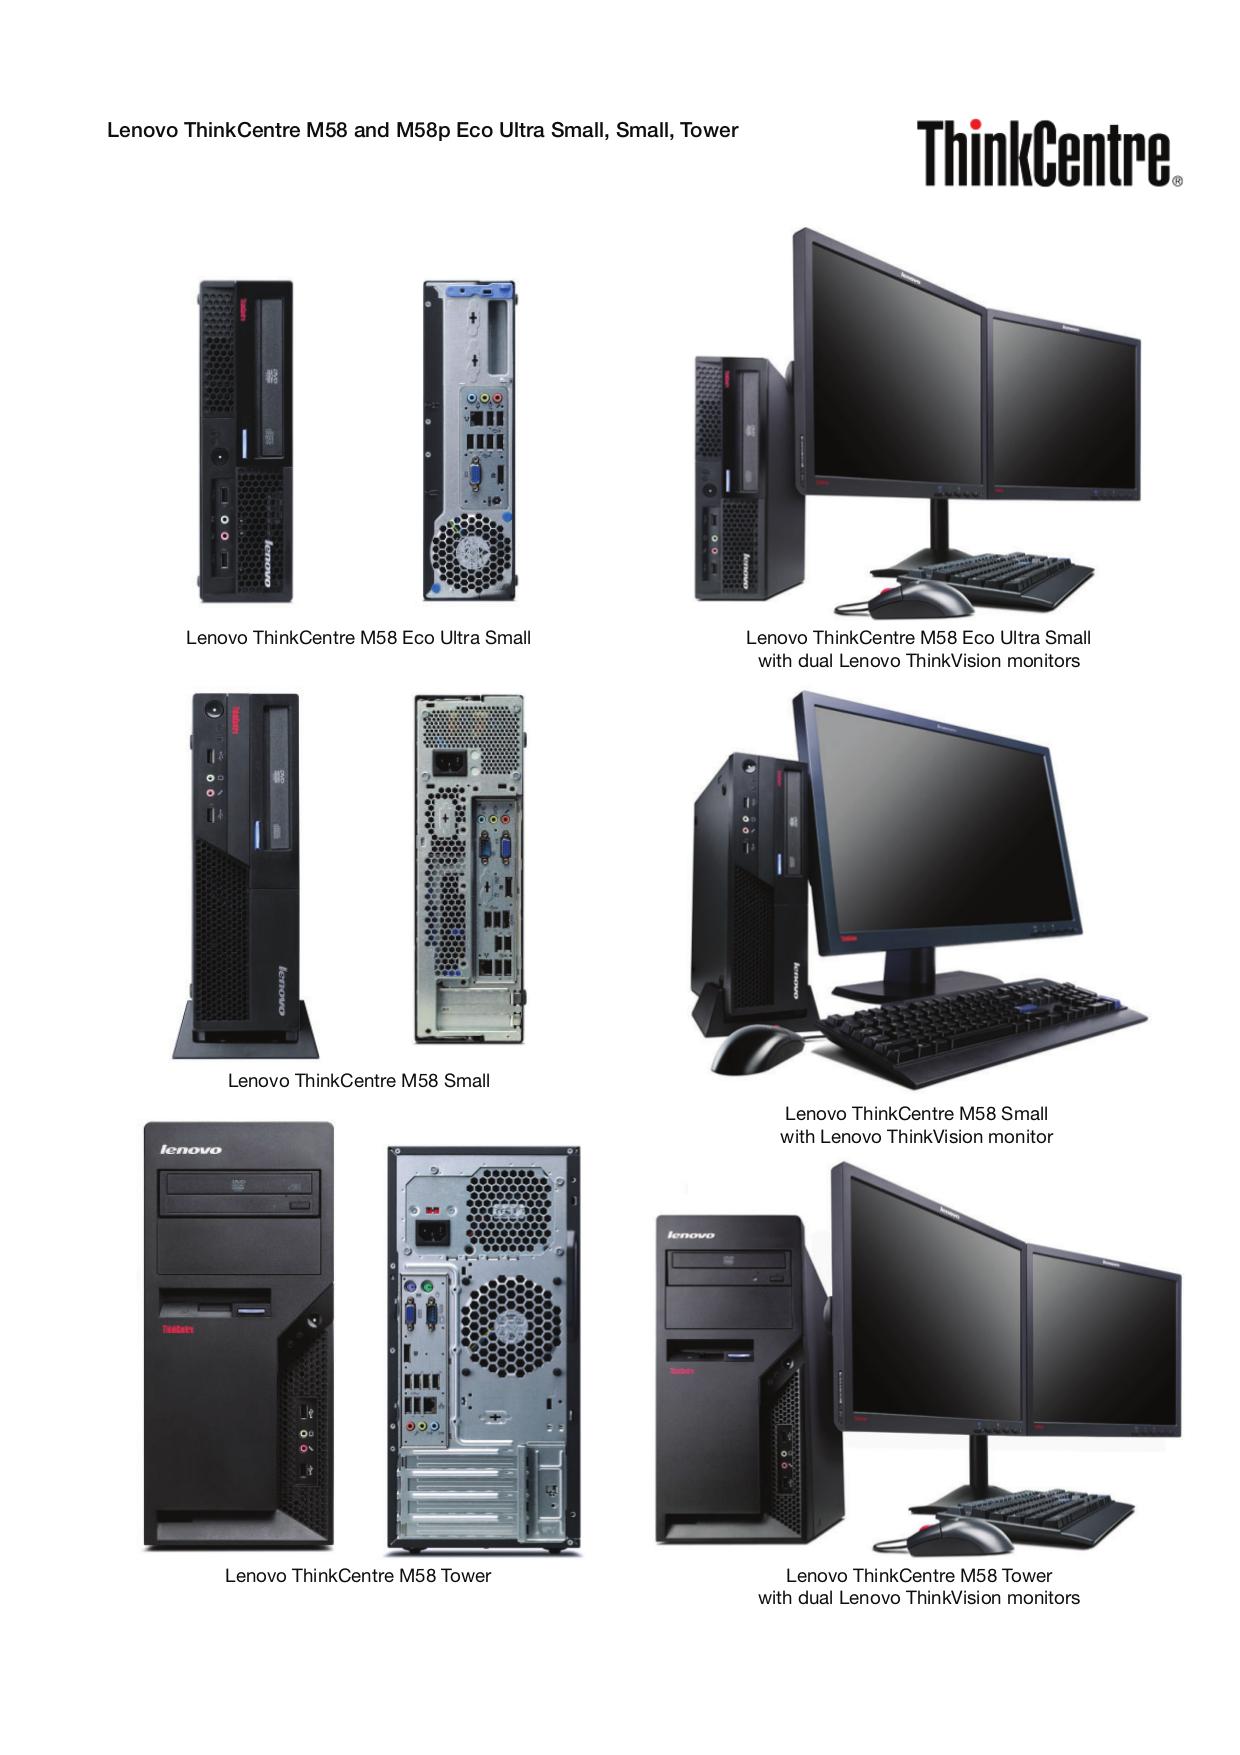 pdf for Lenovo Desktop ThinkCentre M58p 6136 manual